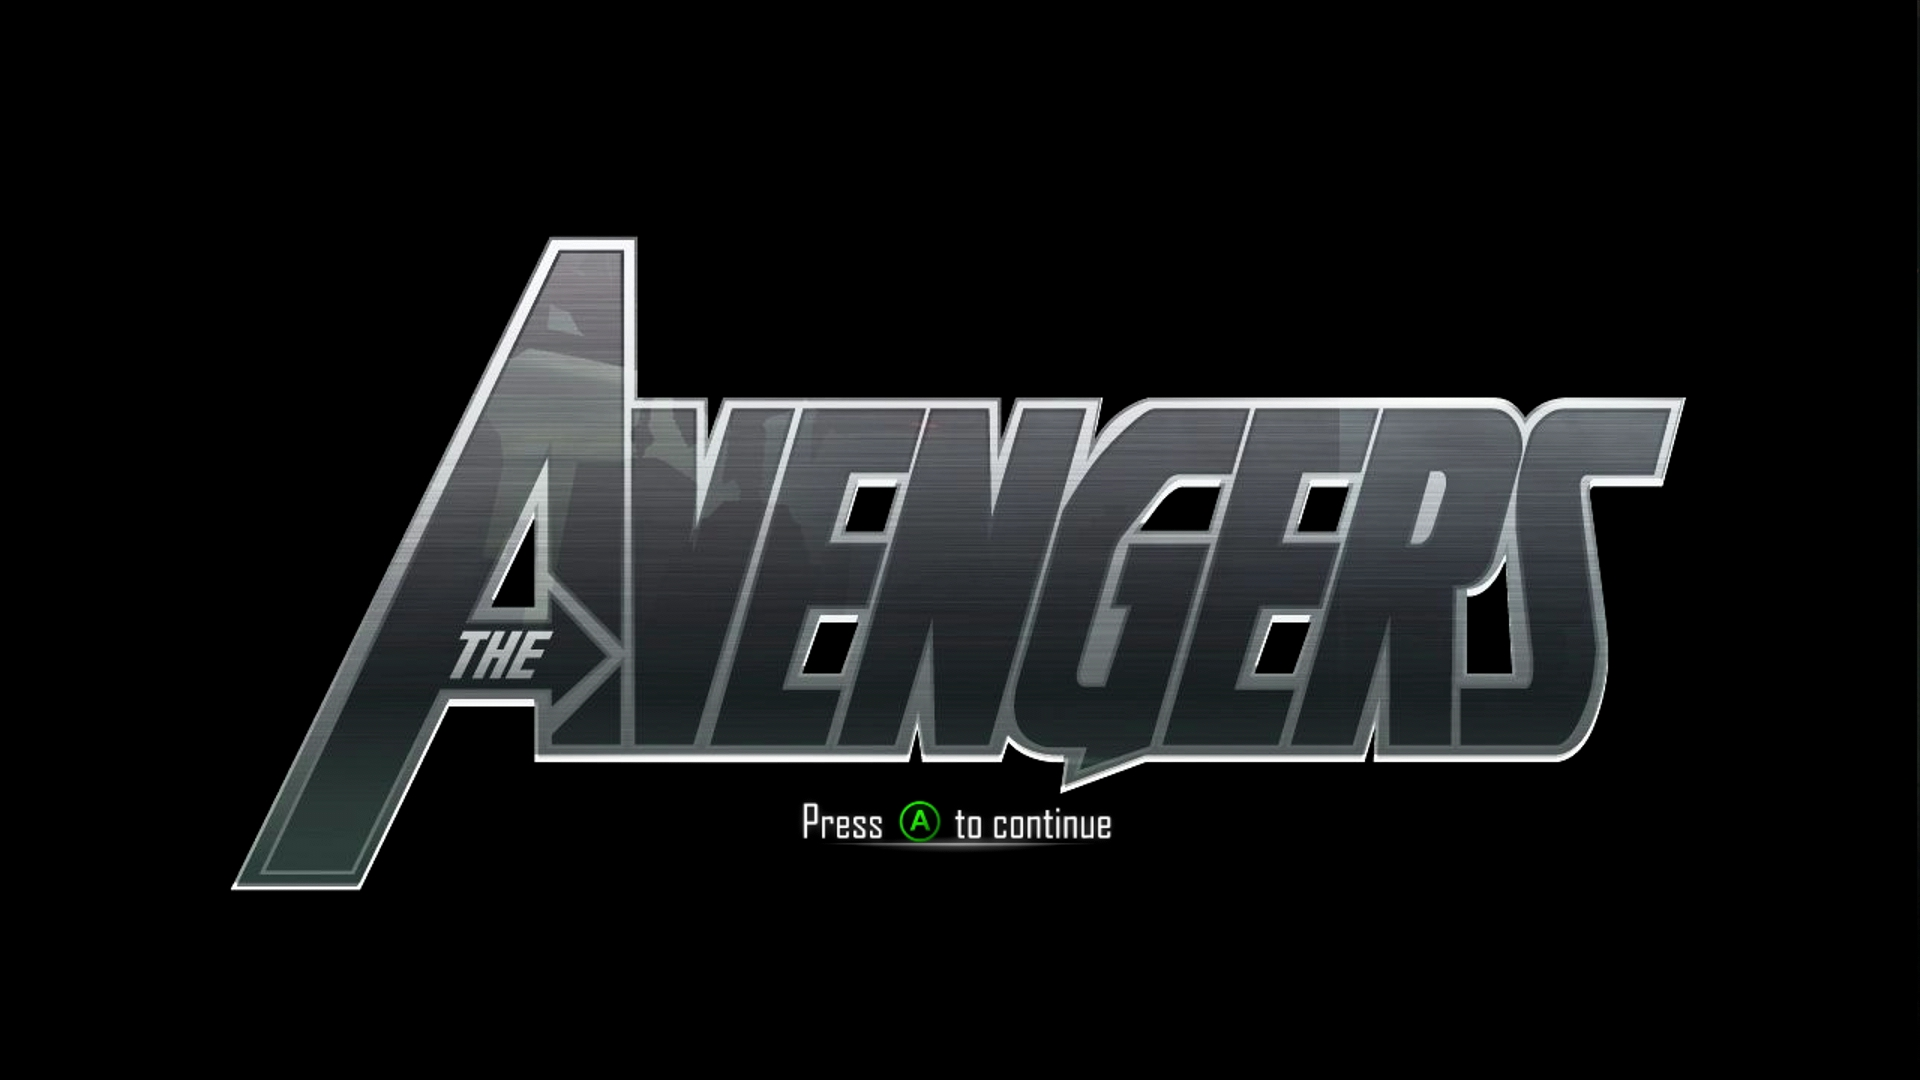 THQ被取消的《复仇者联盟》演示曝光 游戏完成度